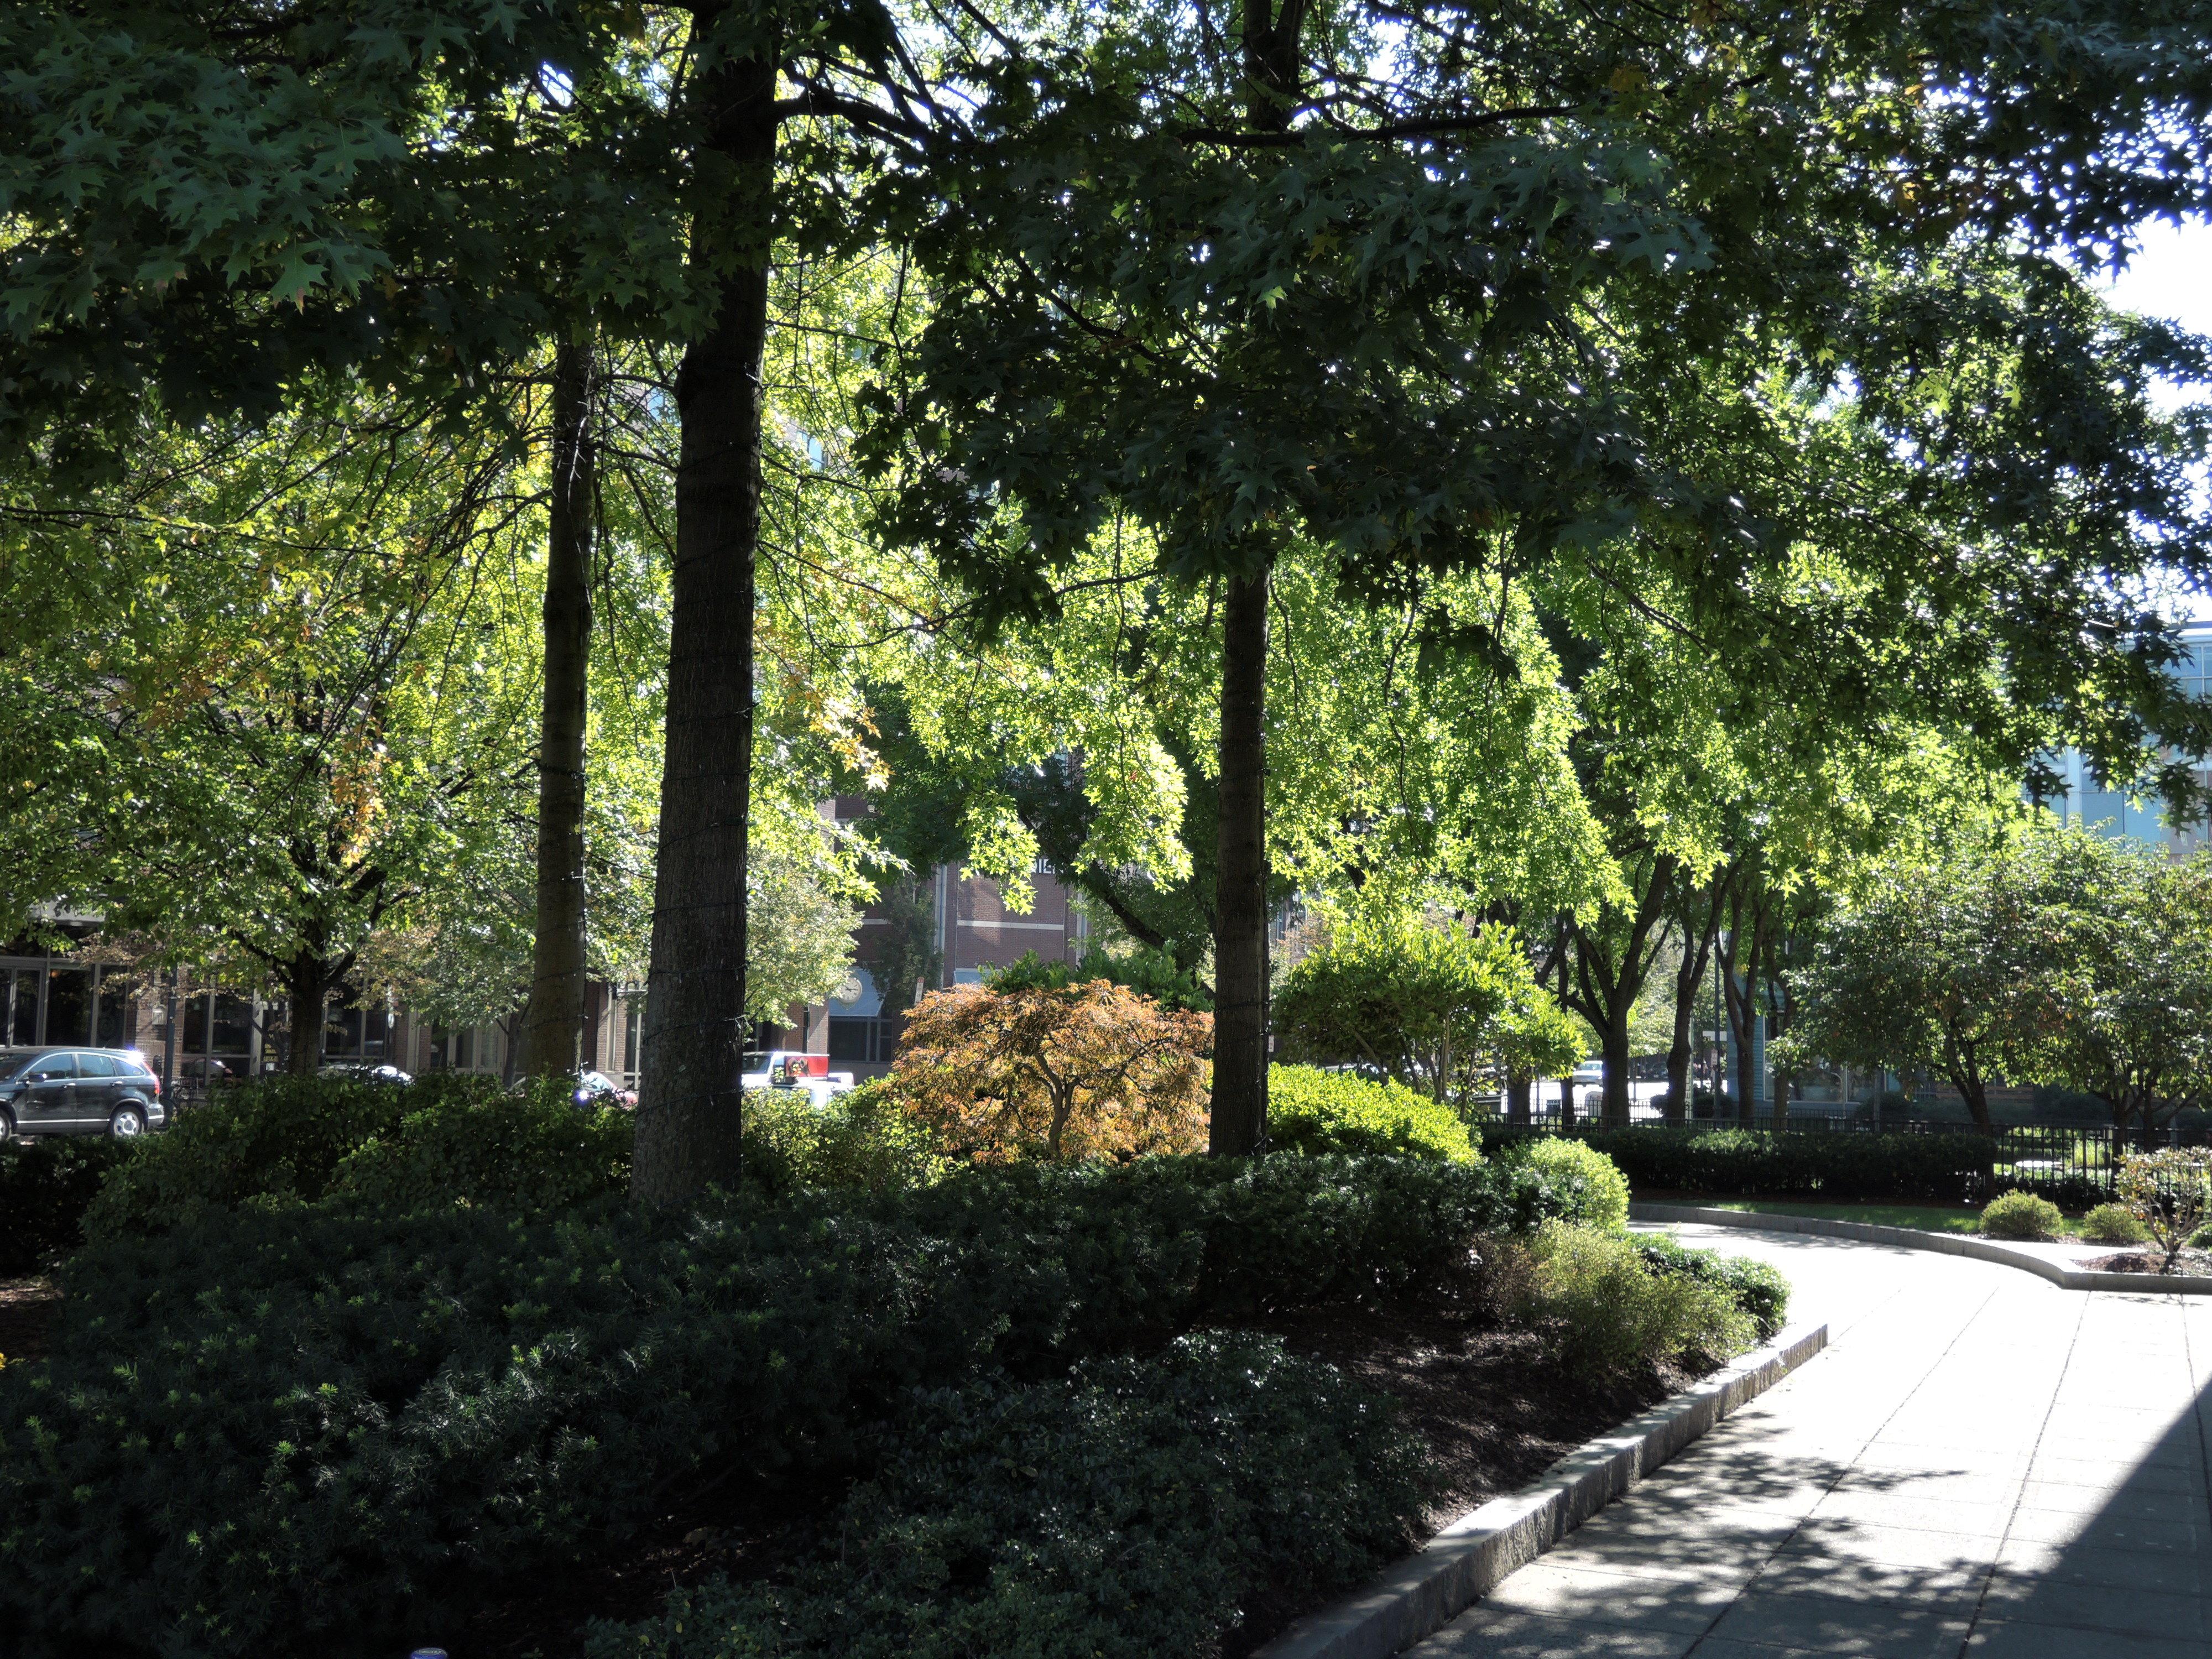 A sample photo of a park taken by the Nikon Coolpix P340.